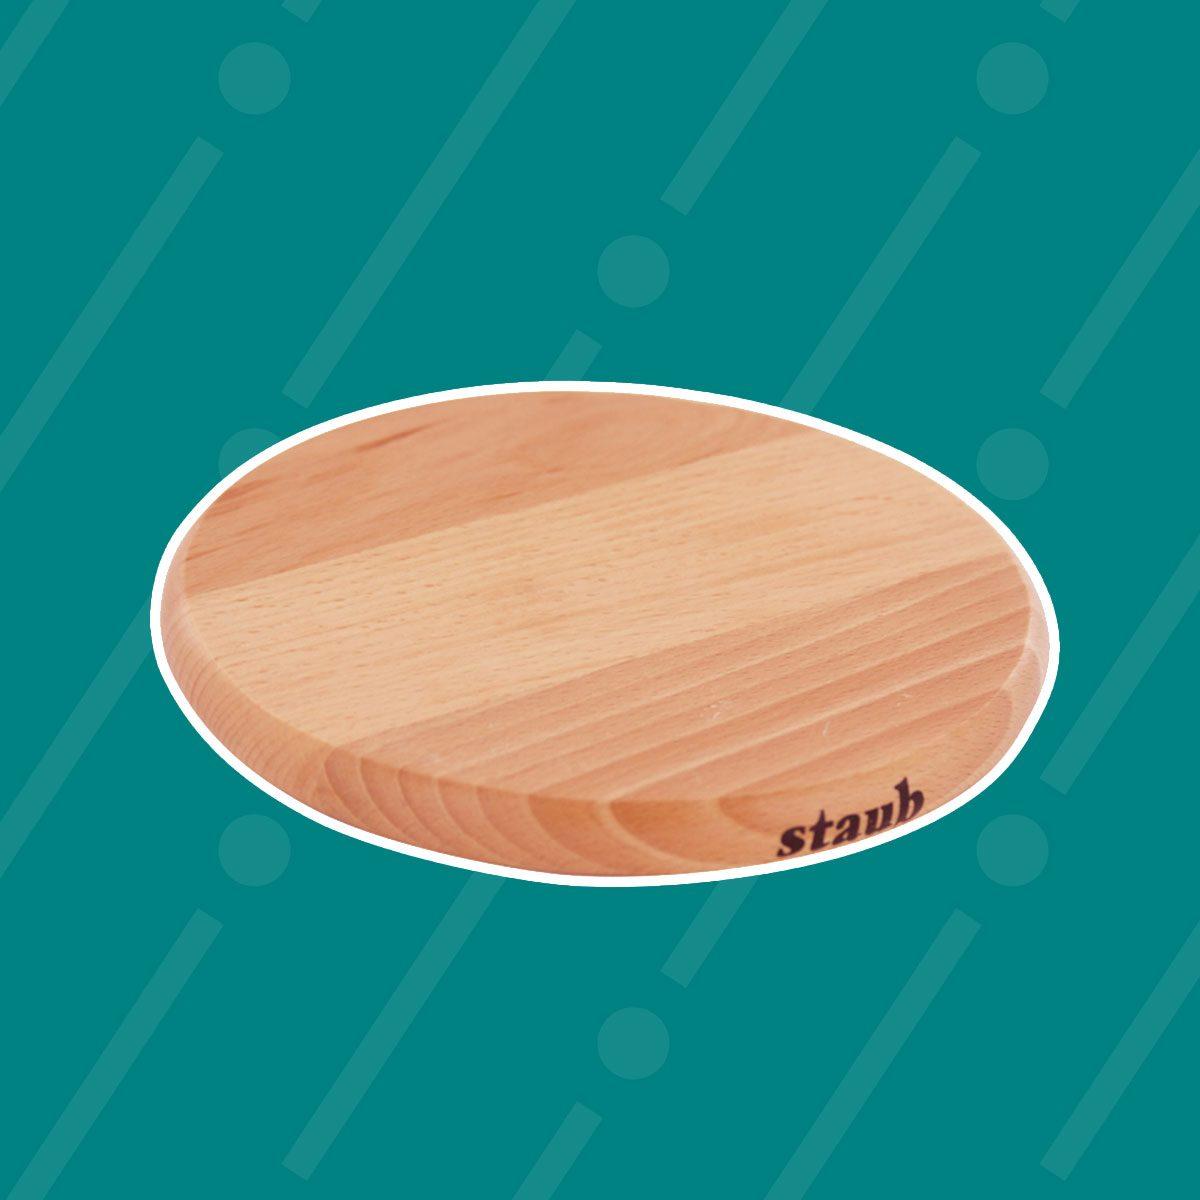 Staub Magnetic Round Wooden Trivet